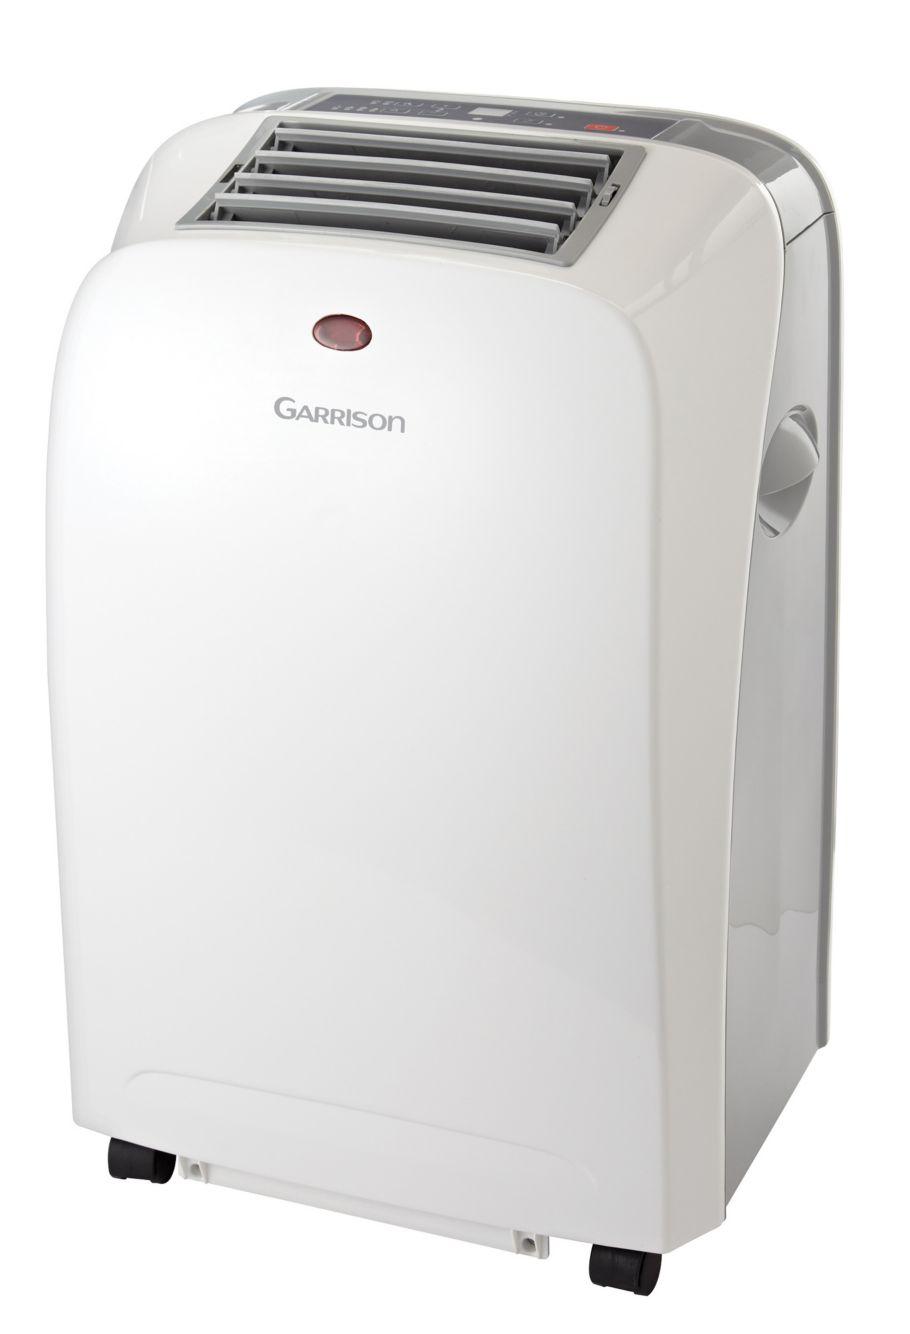 canadian tire warm ct garrison portable 7000 btu 2 speed air conditioner dehumidifier. Black Bedroom Furniture Sets. Home Design Ideas